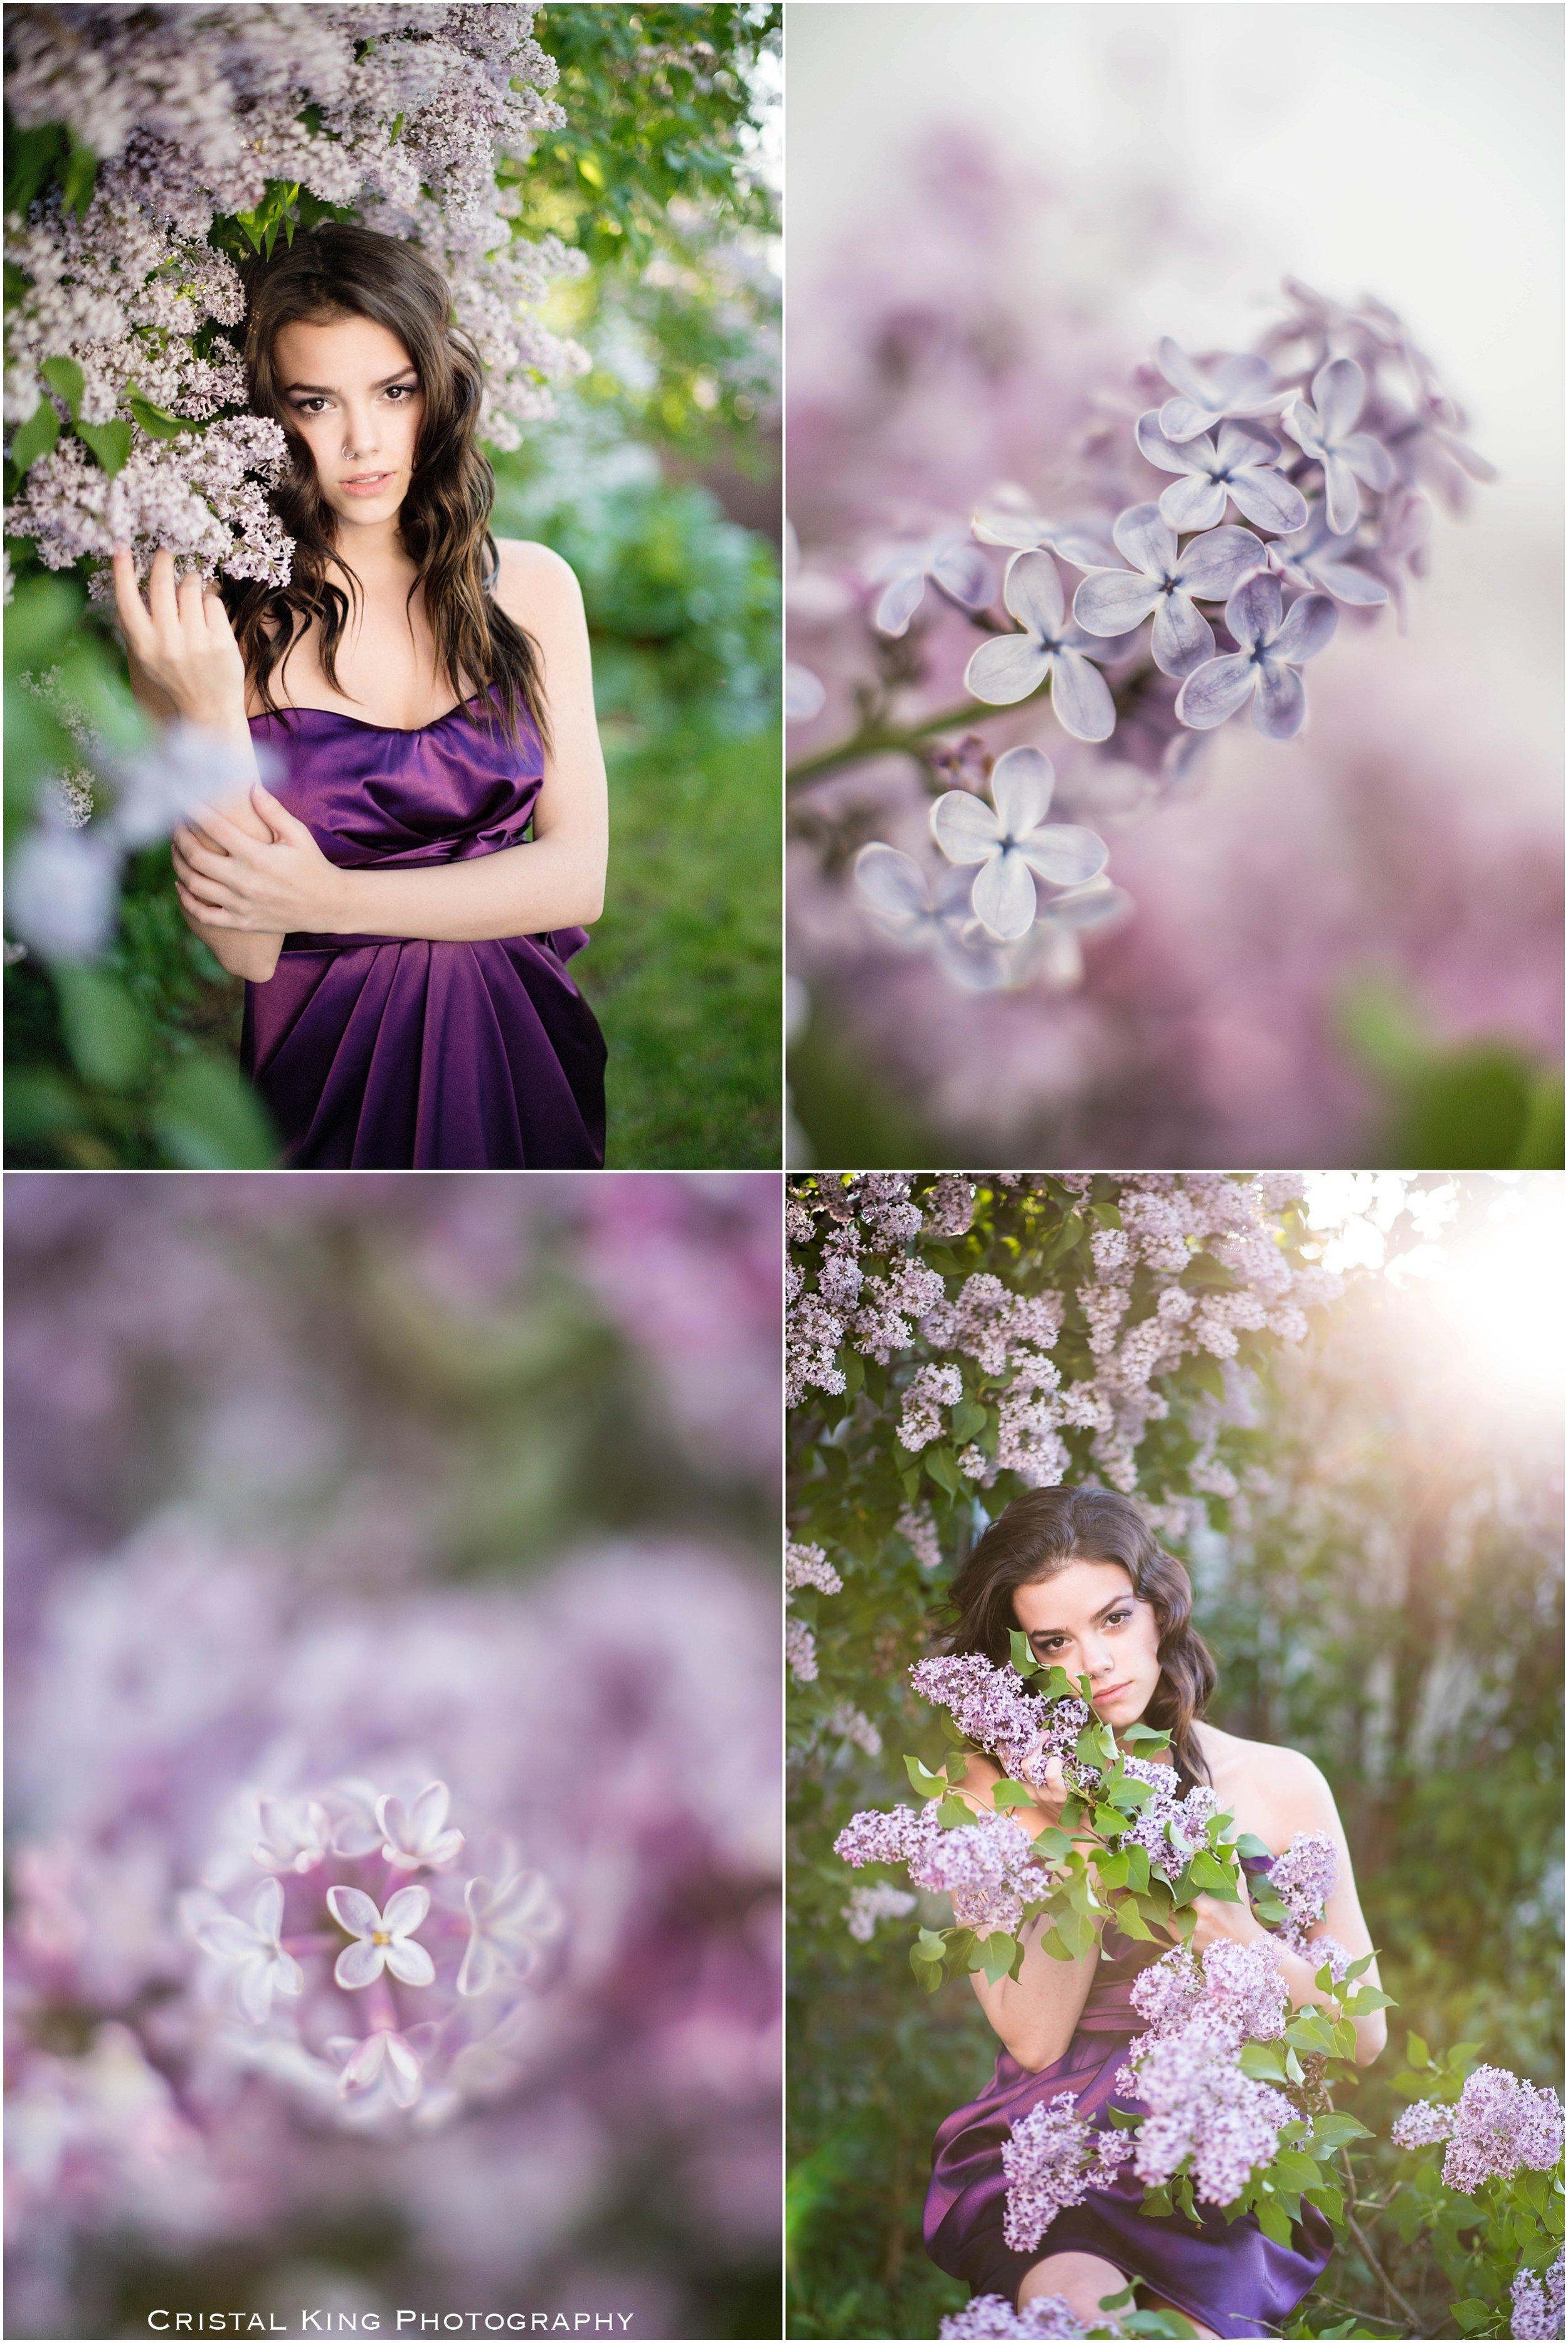 ck1photos-7195-Edit-Edit.jpg